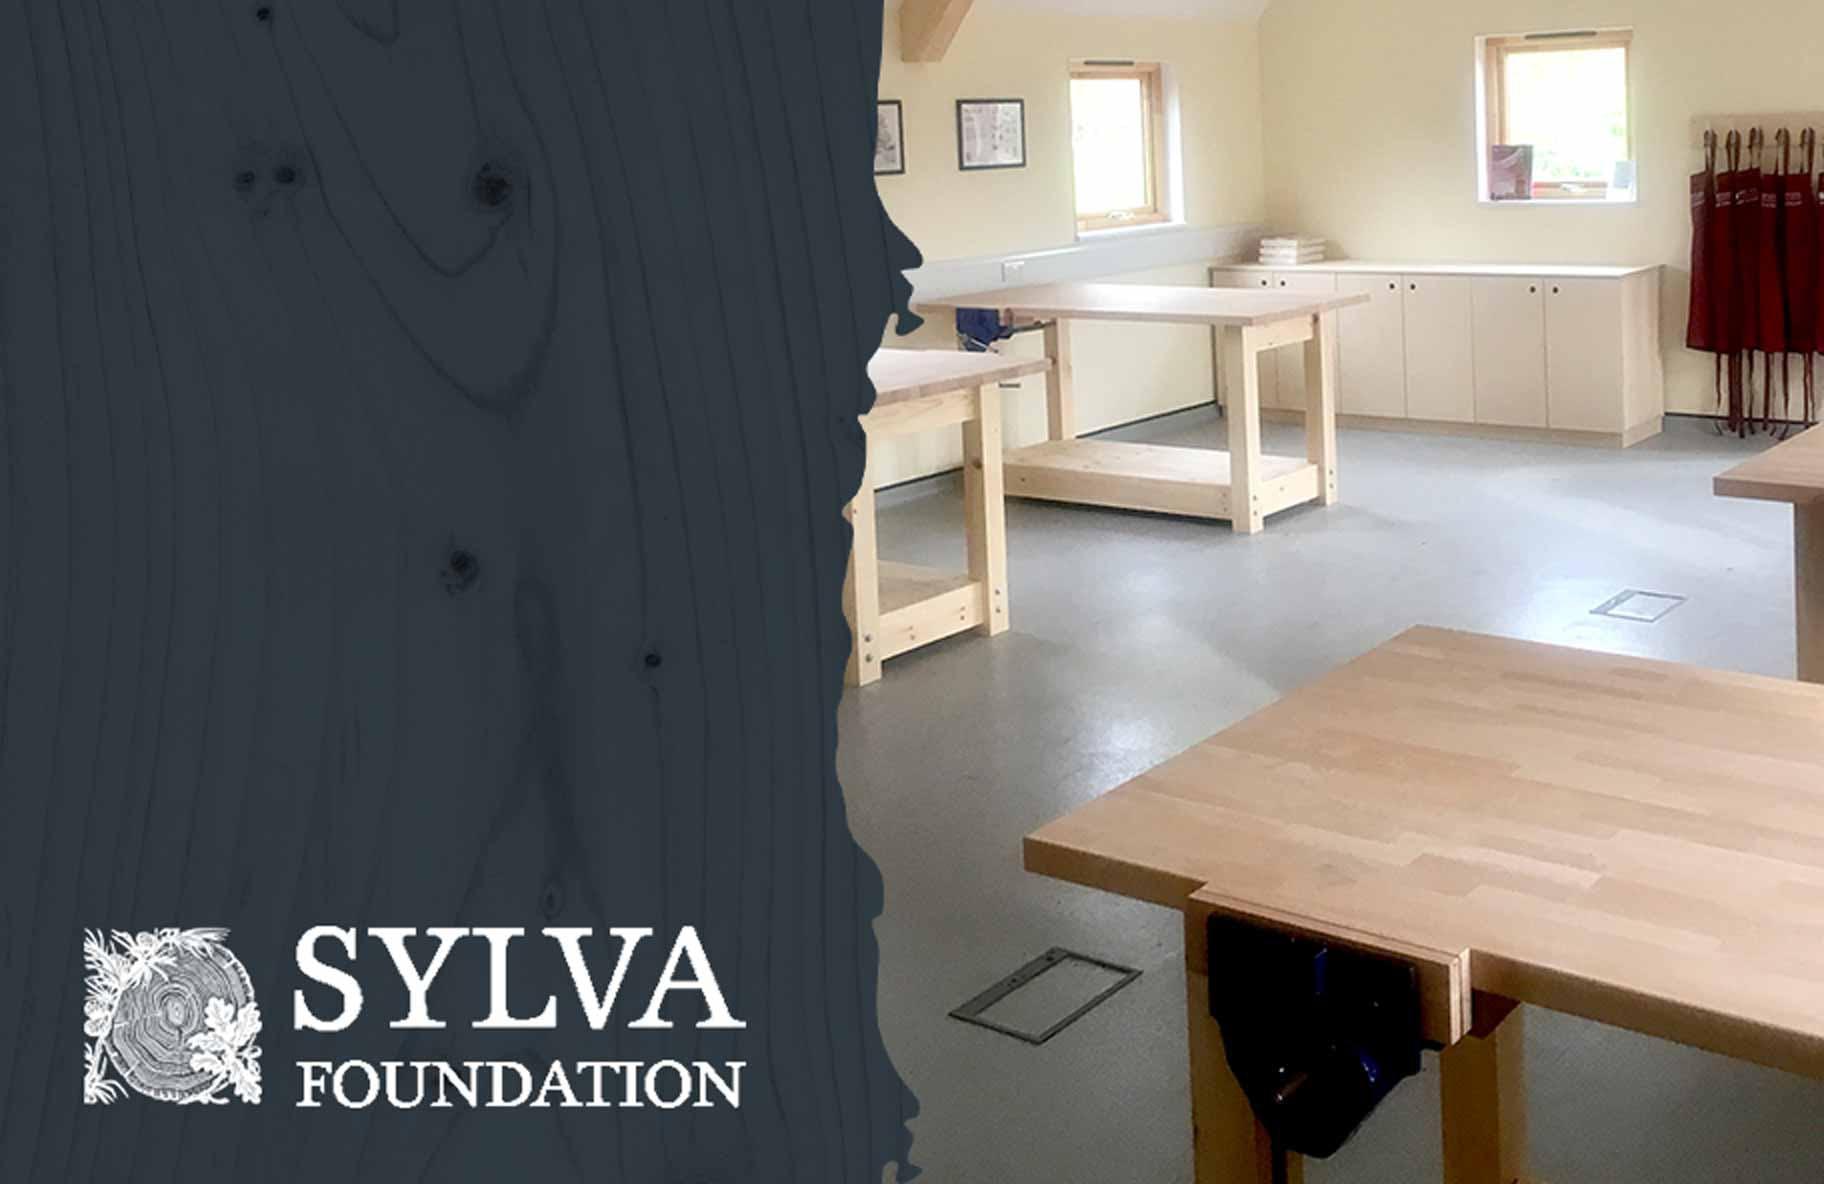 Sylvia Foundation